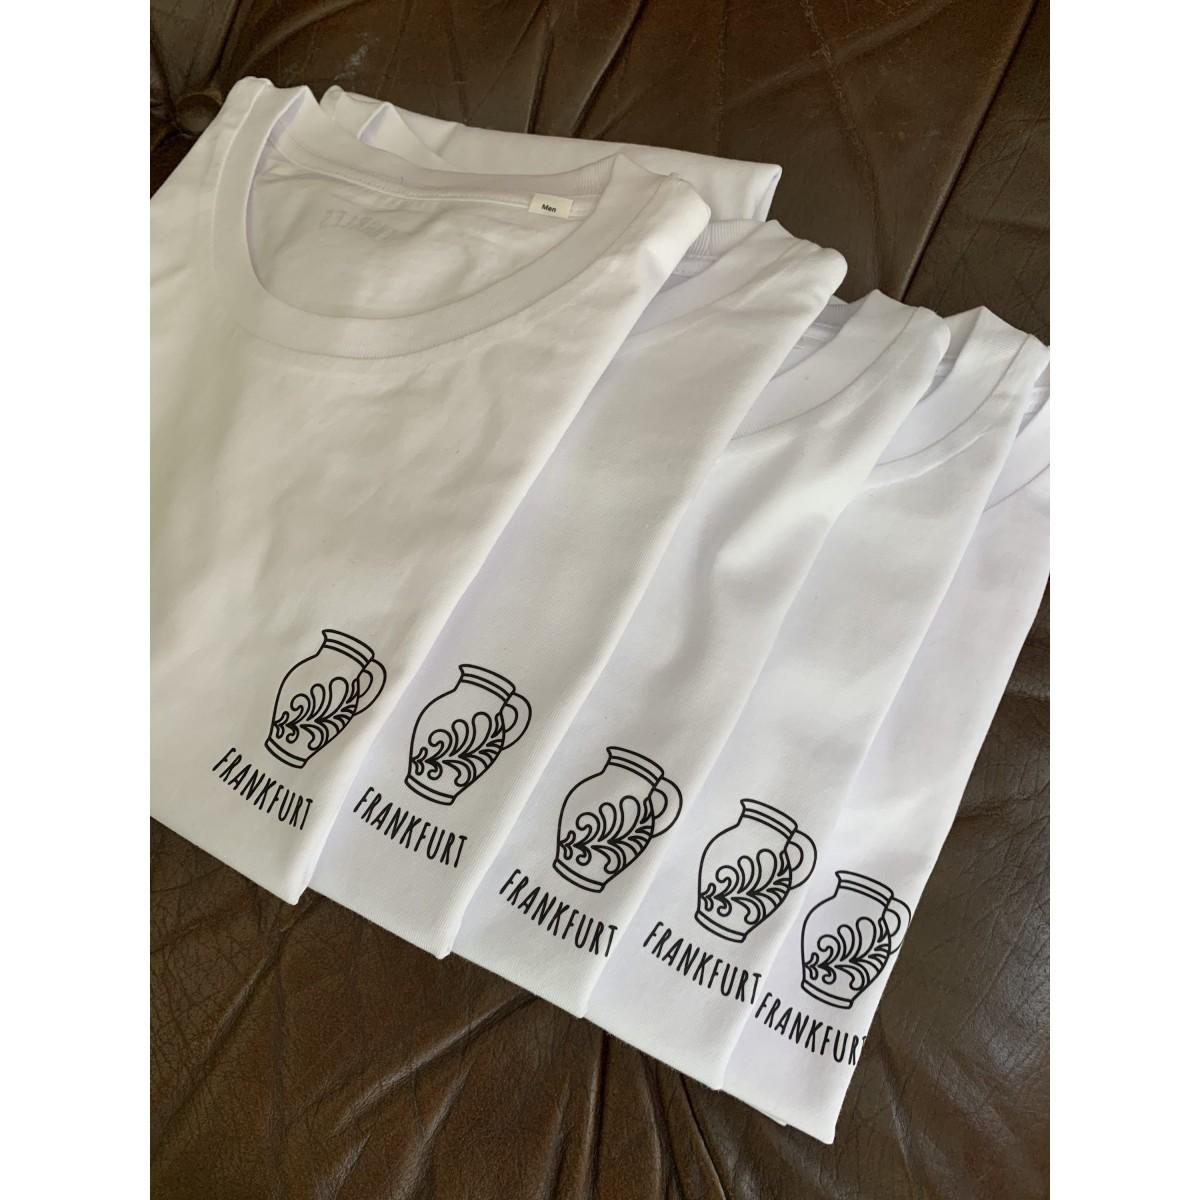 Charles / Shirt Frankfurt / 100% Biobaumwolle / Fair Wear zertifiziert